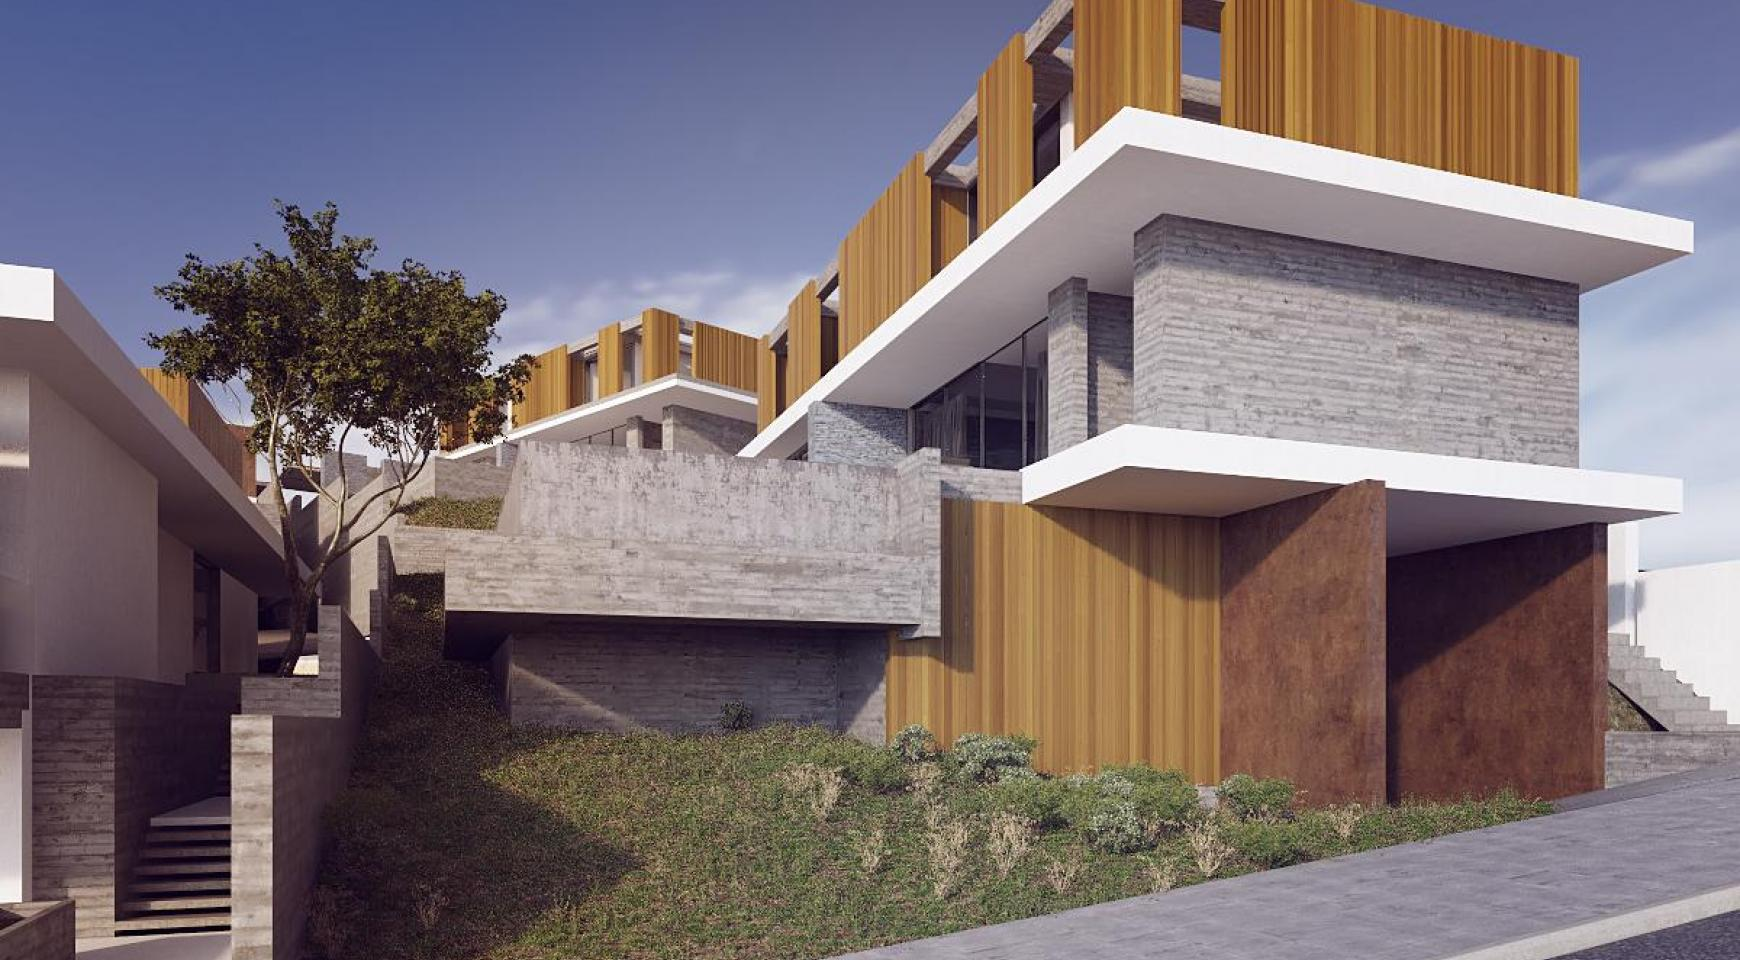 Exclusive 3 Bedroom Villa with Stunning Views in Germasogeia - 5